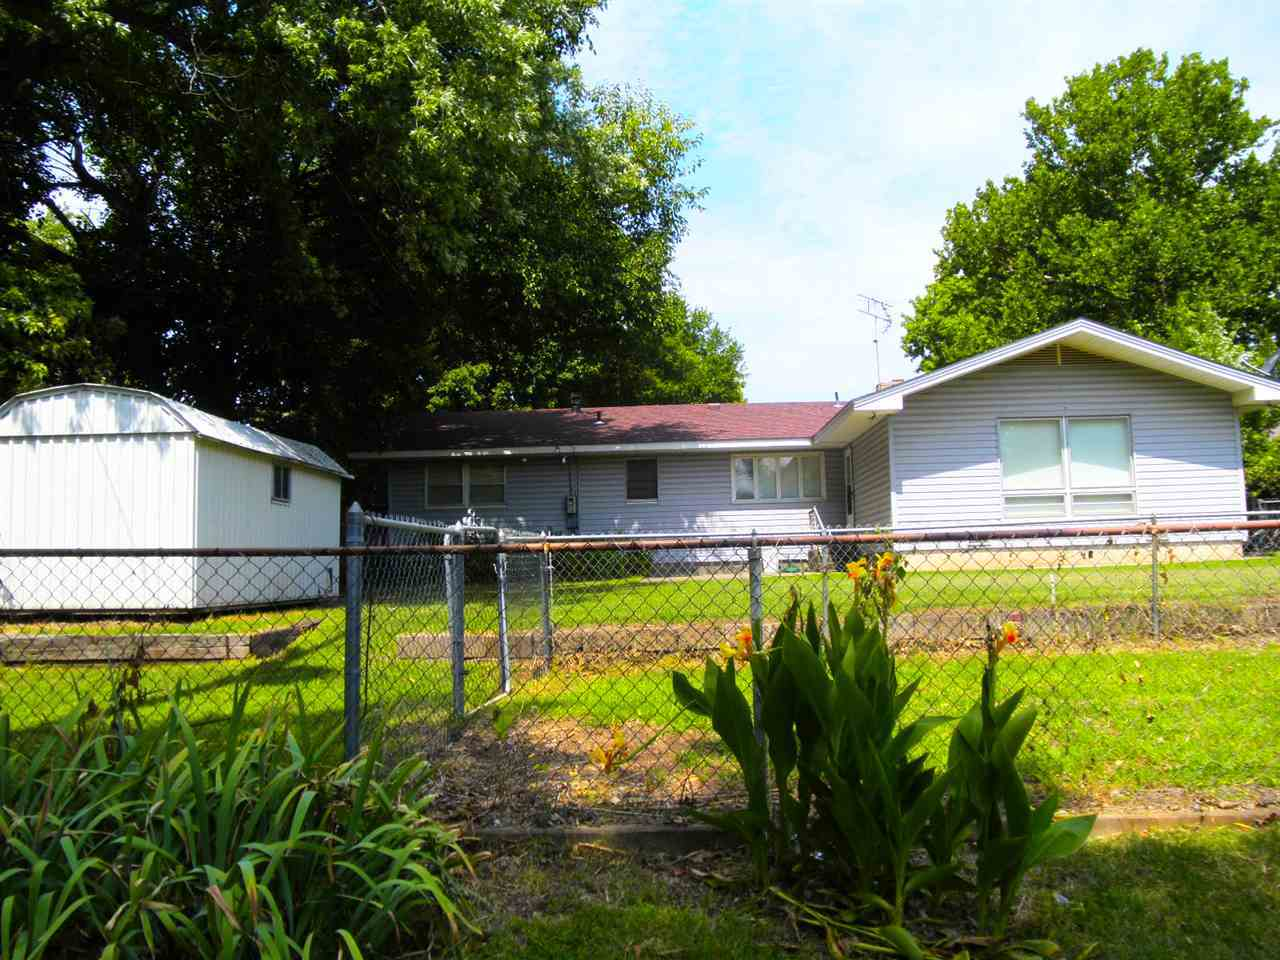 Sold Cross Sale W/ MLS | 1601 Blackard Ponca City, OK 74604 21